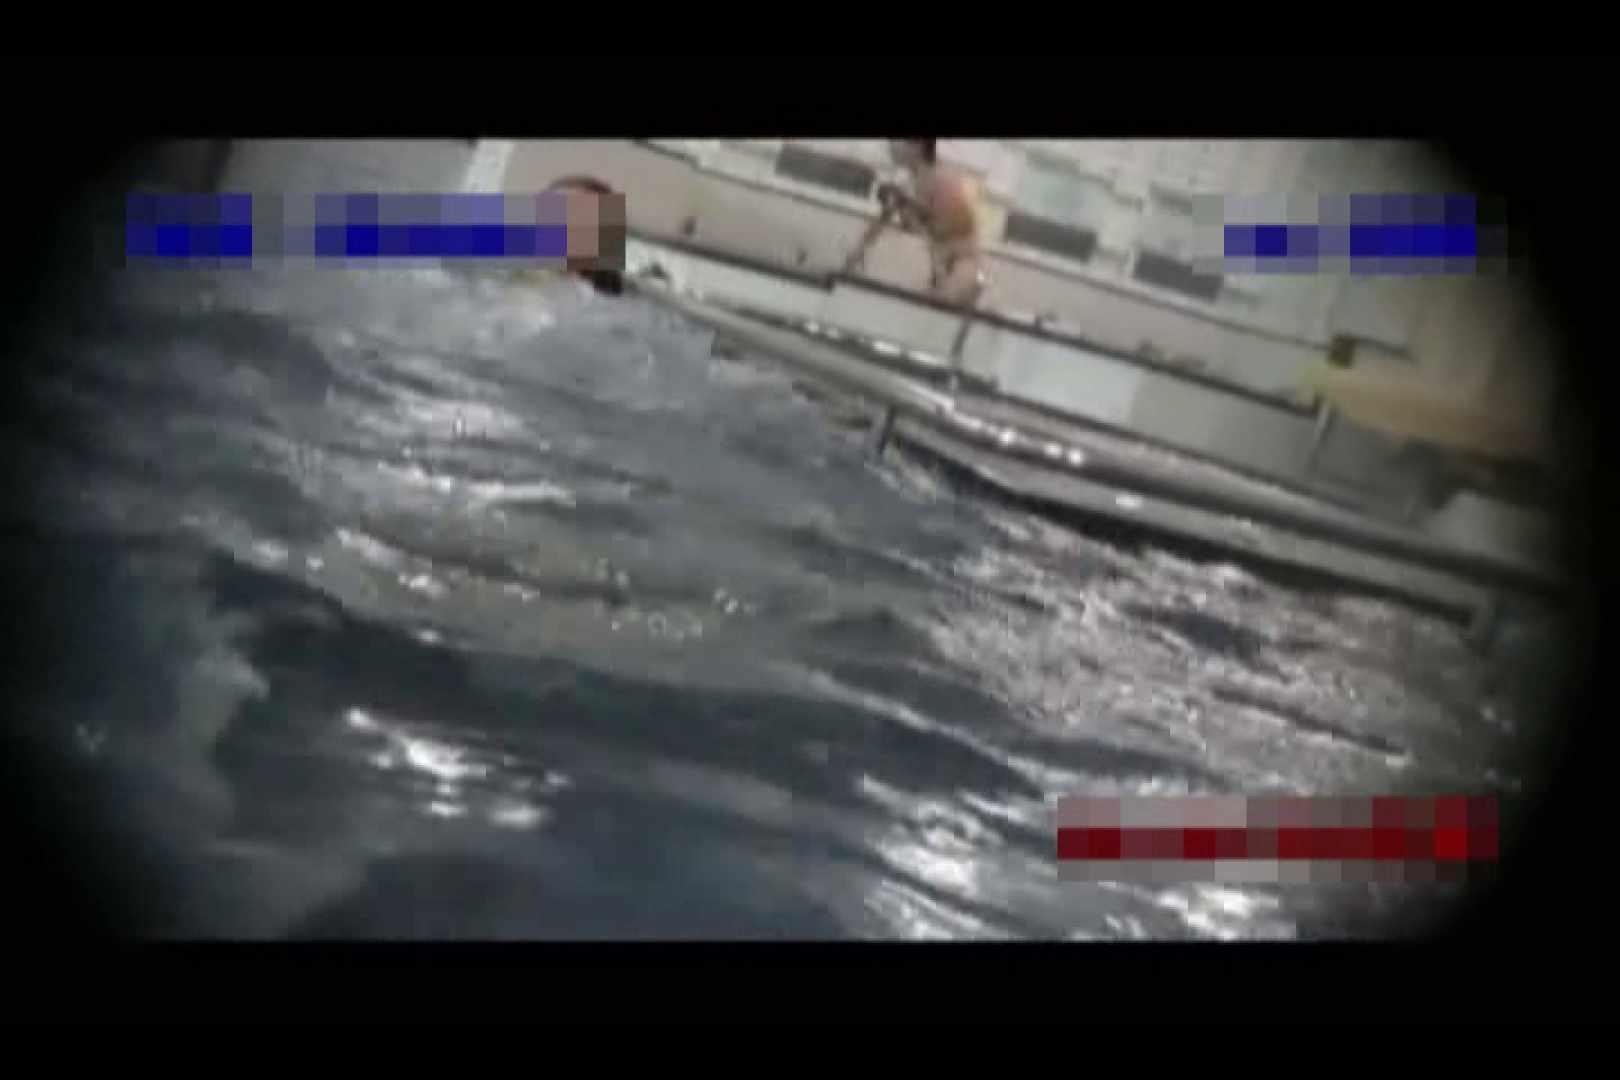 未熟な珊瑚礁 vol.15 盗撮 | 潜入  91画像 29